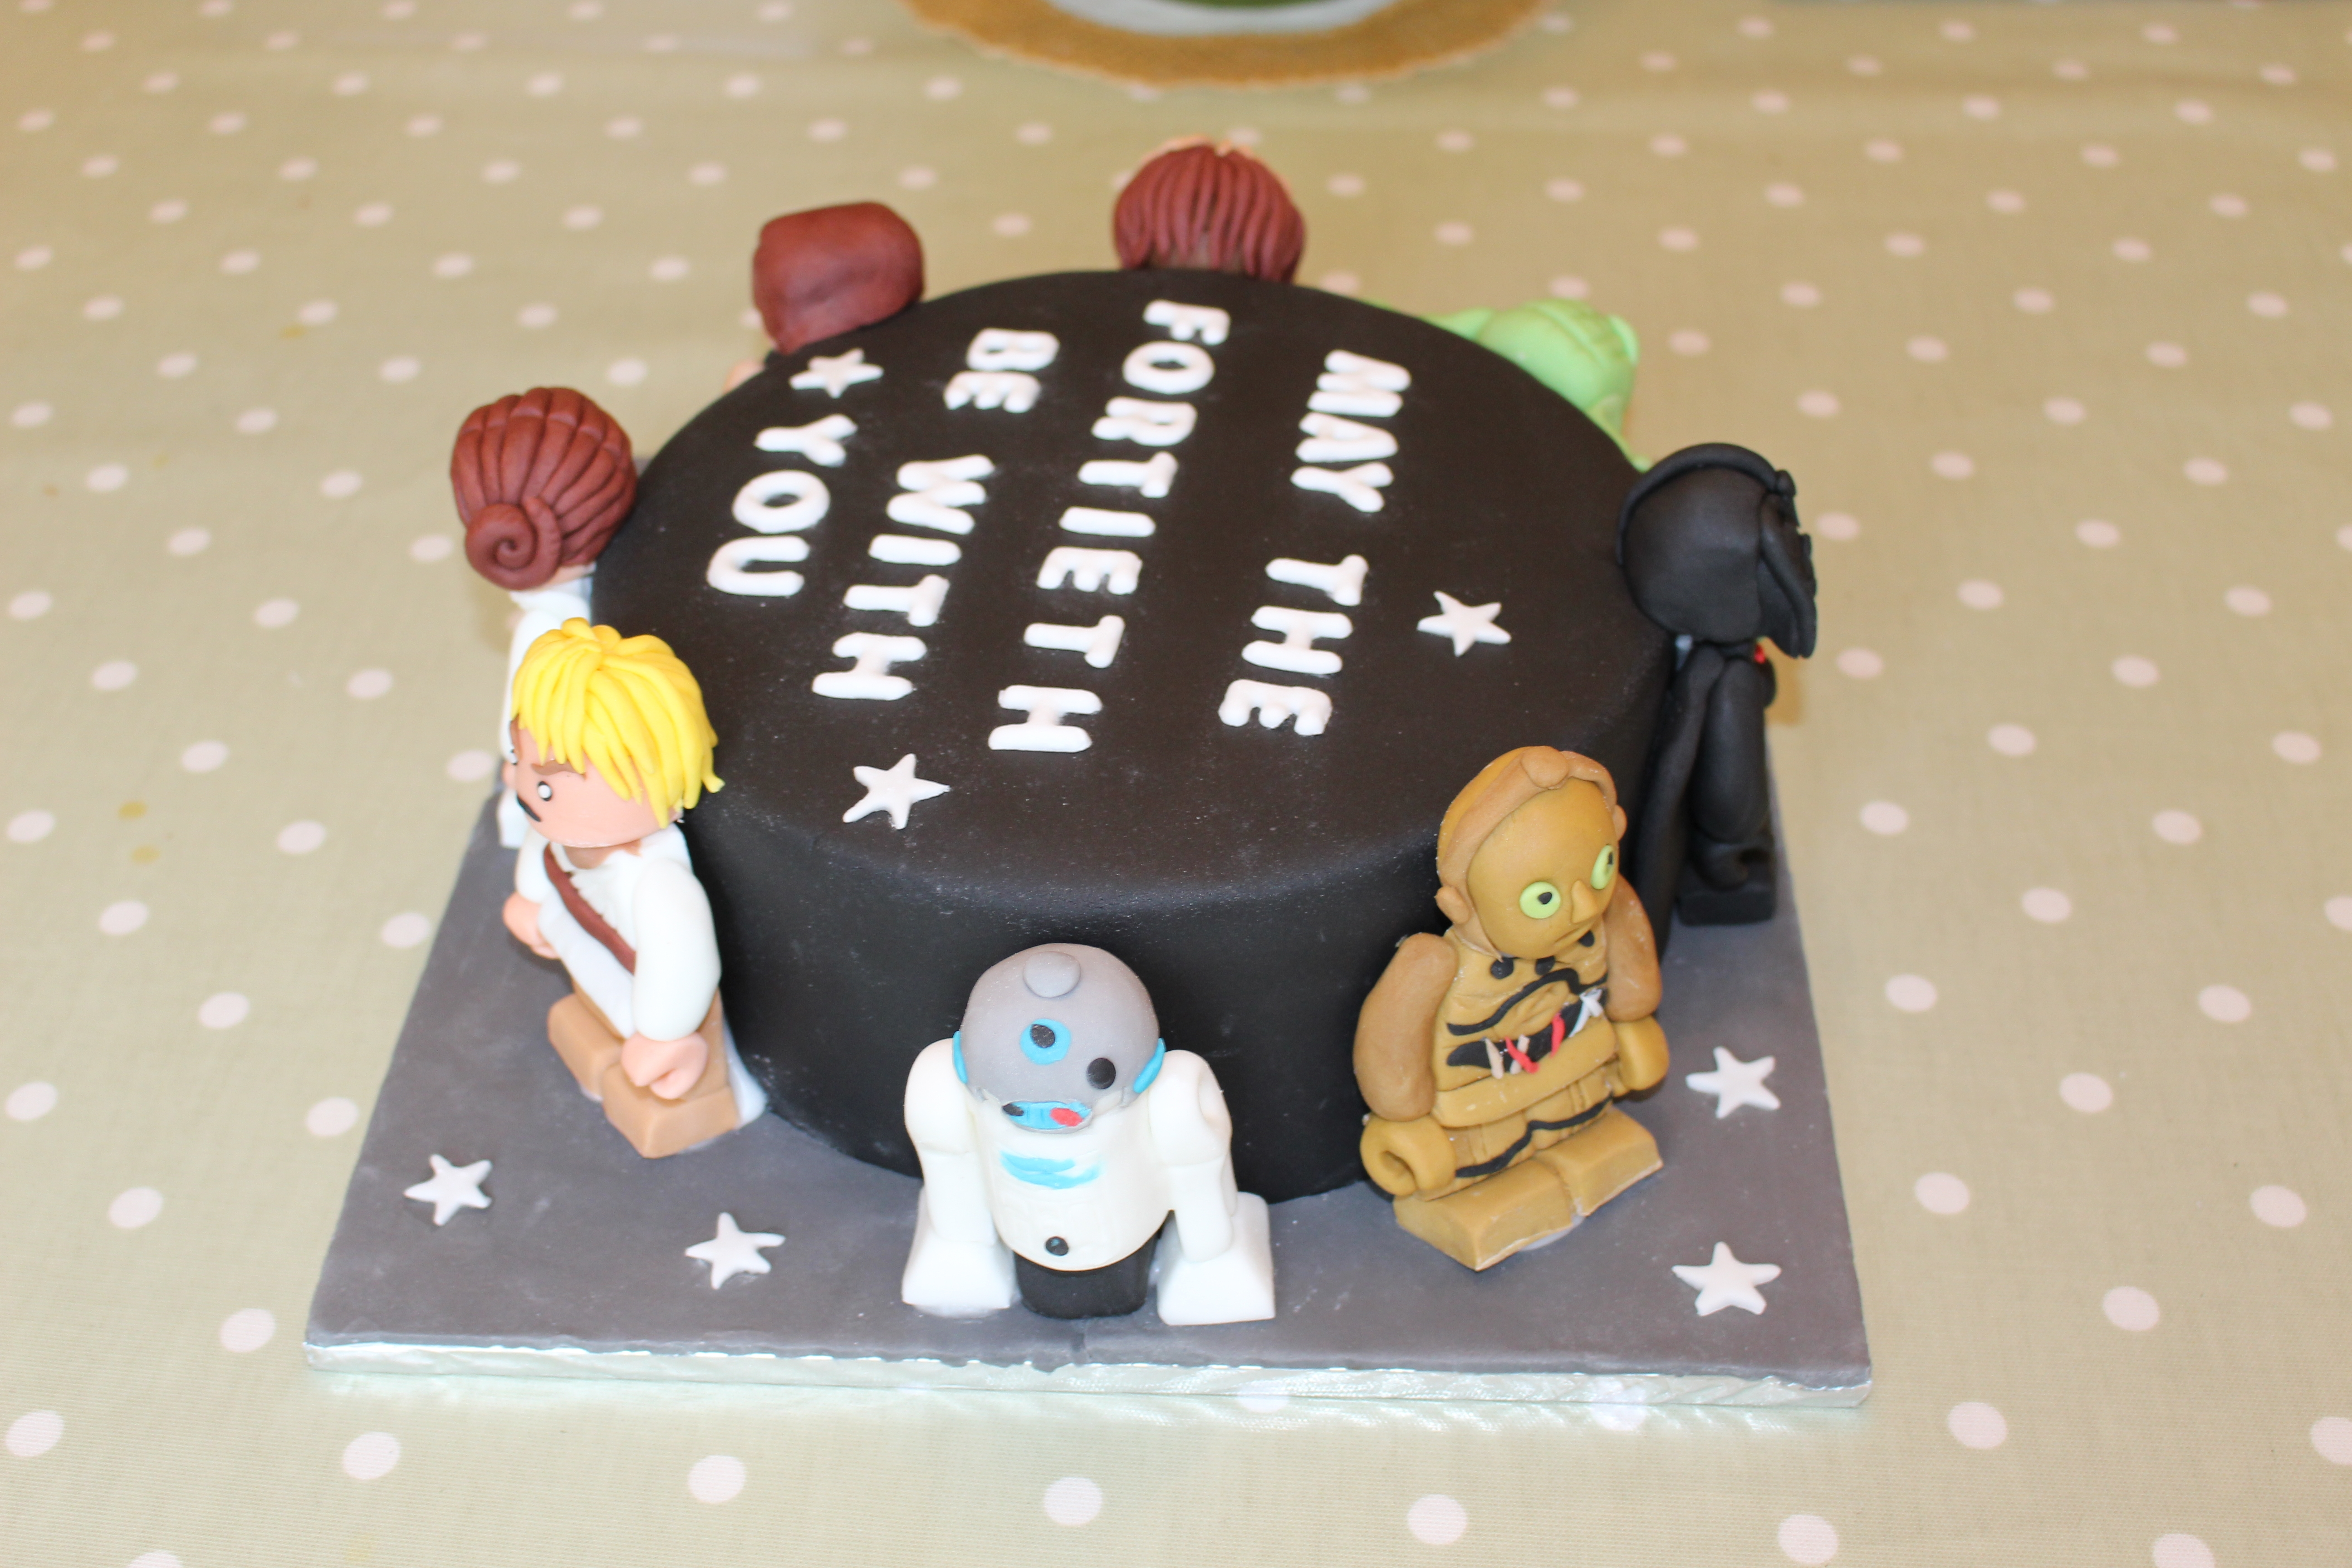 Star Wars Lego 40th Birthday Cake Brickset Forum